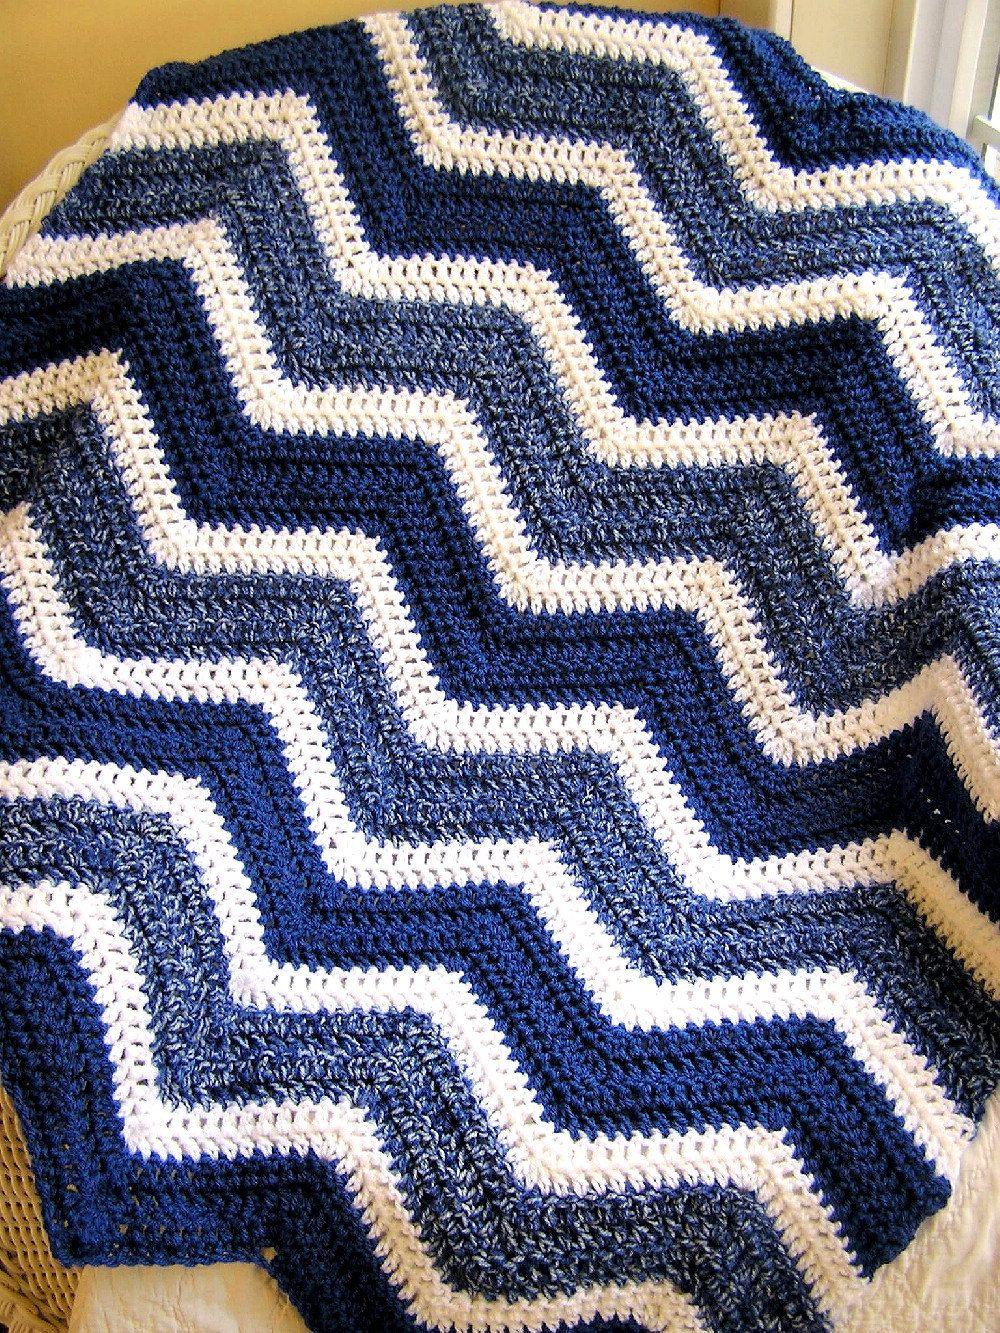 new chevron zig zag baby blanket afghan wrap crochet knit lap ...